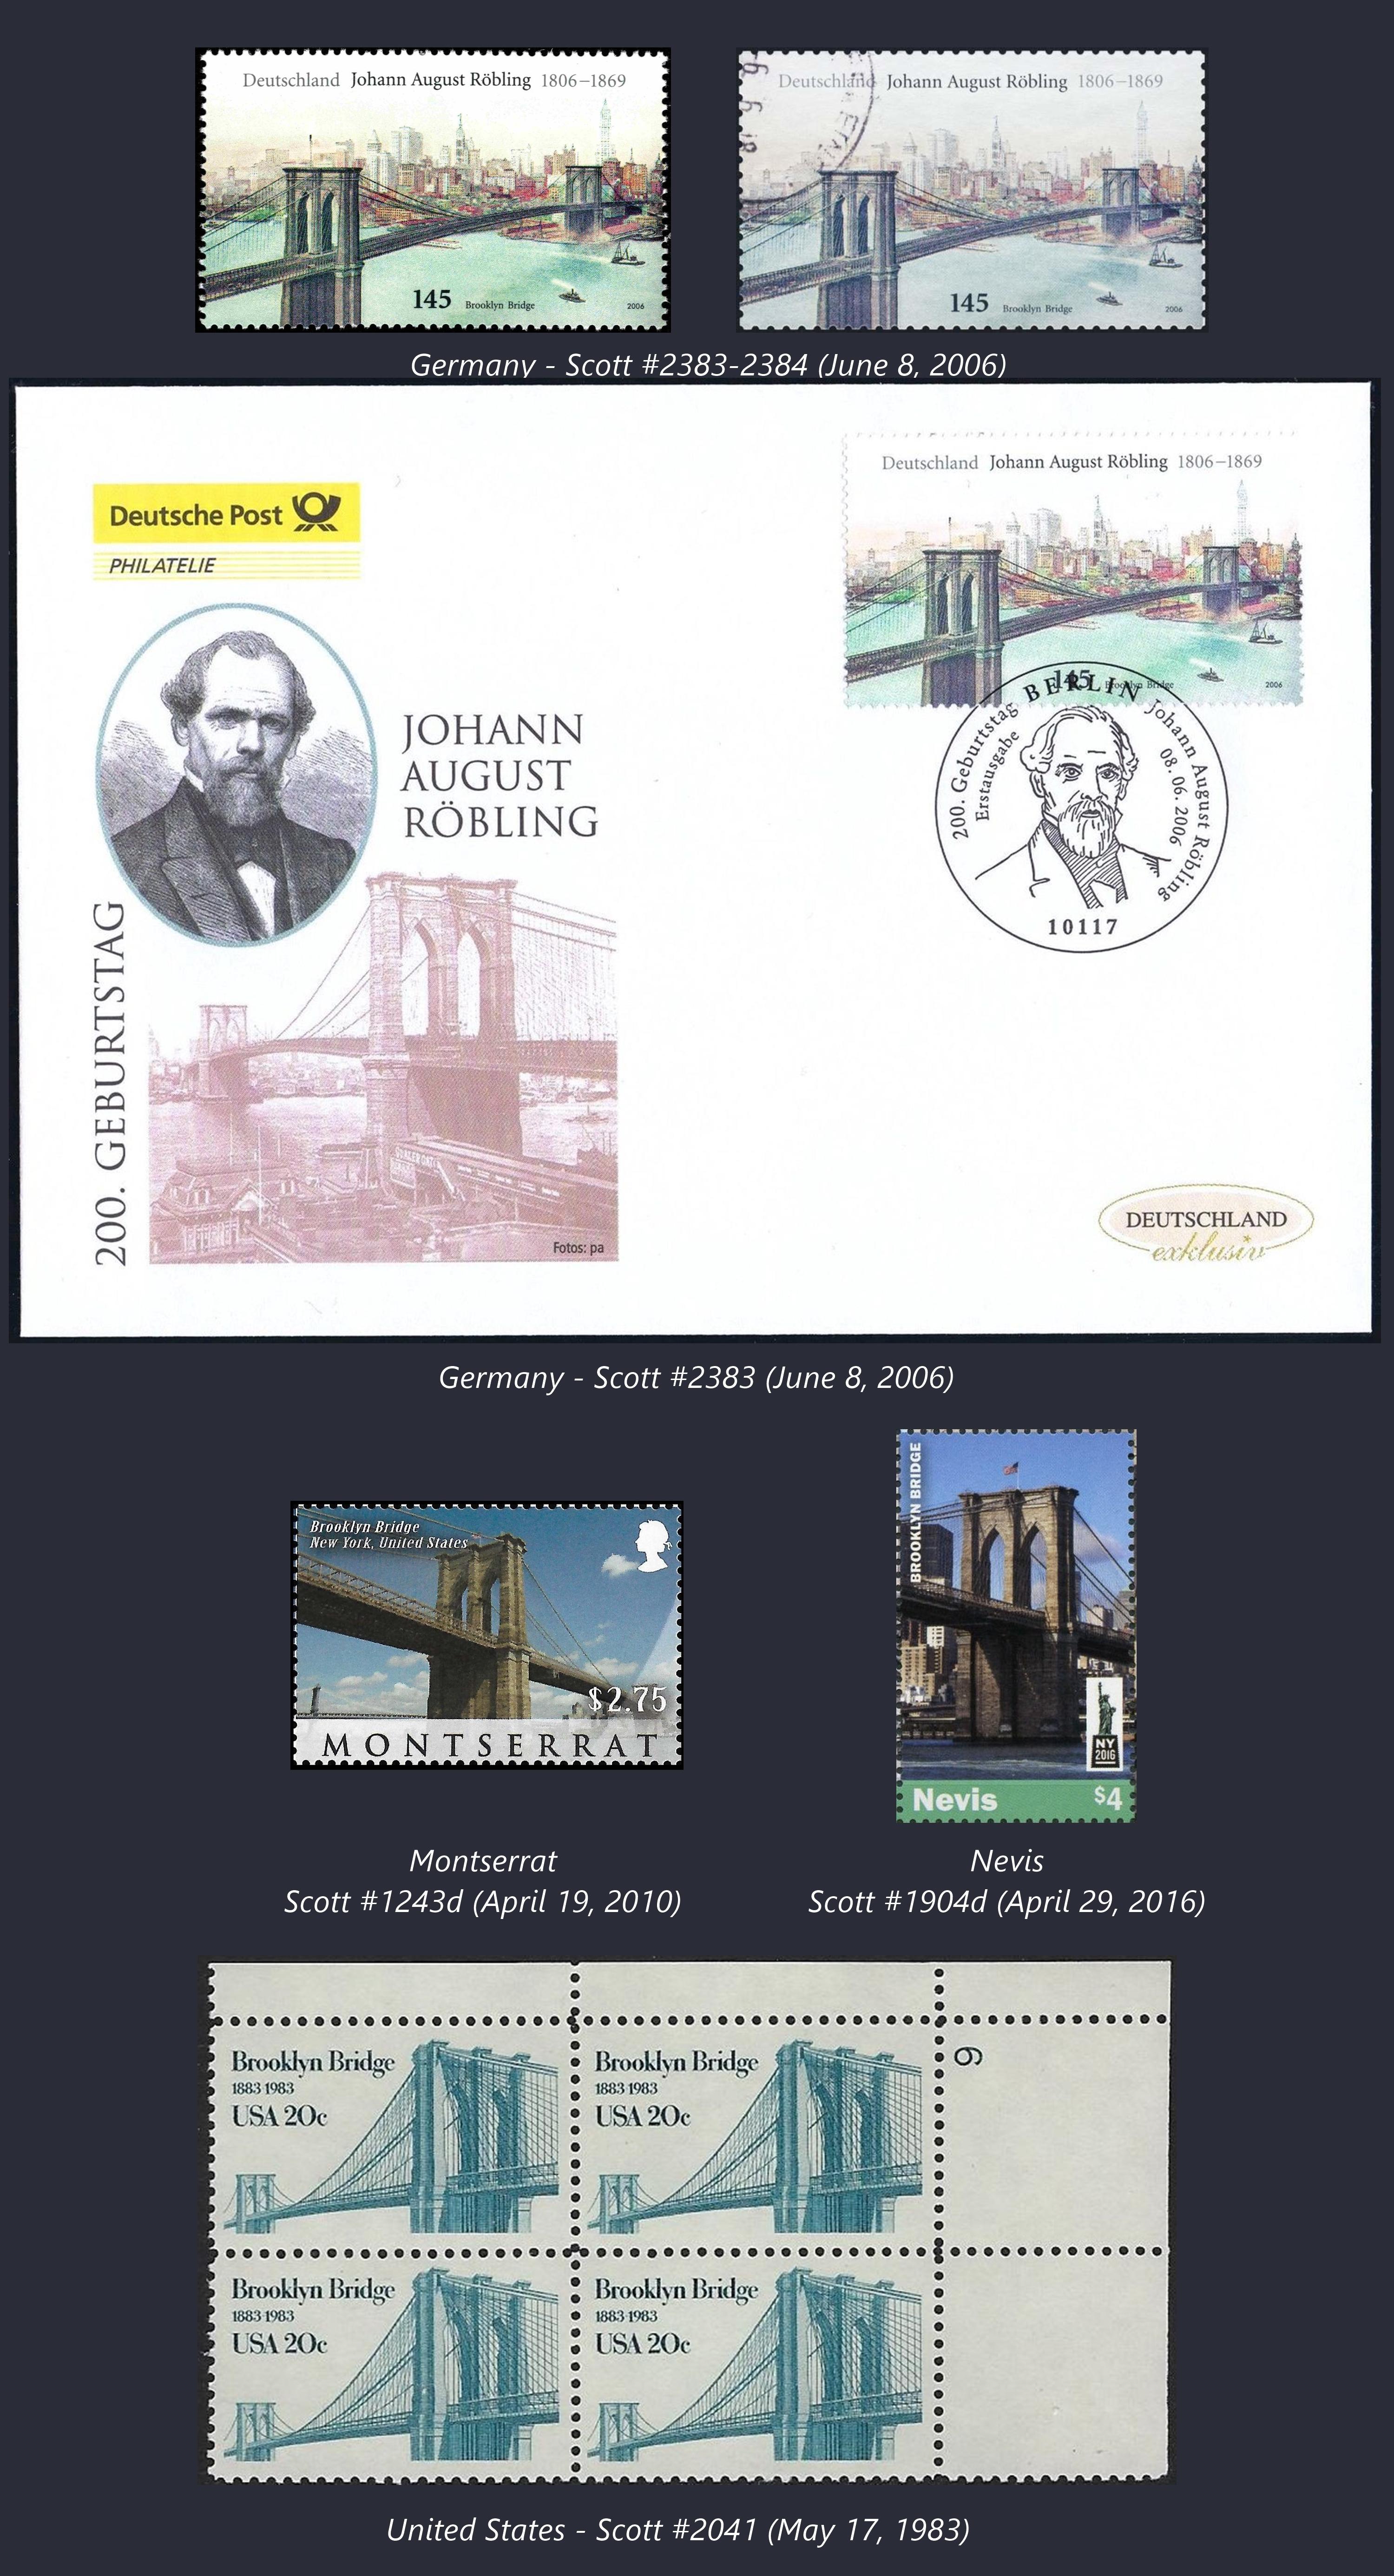 Stamps portraying the Brooklyn Bridge